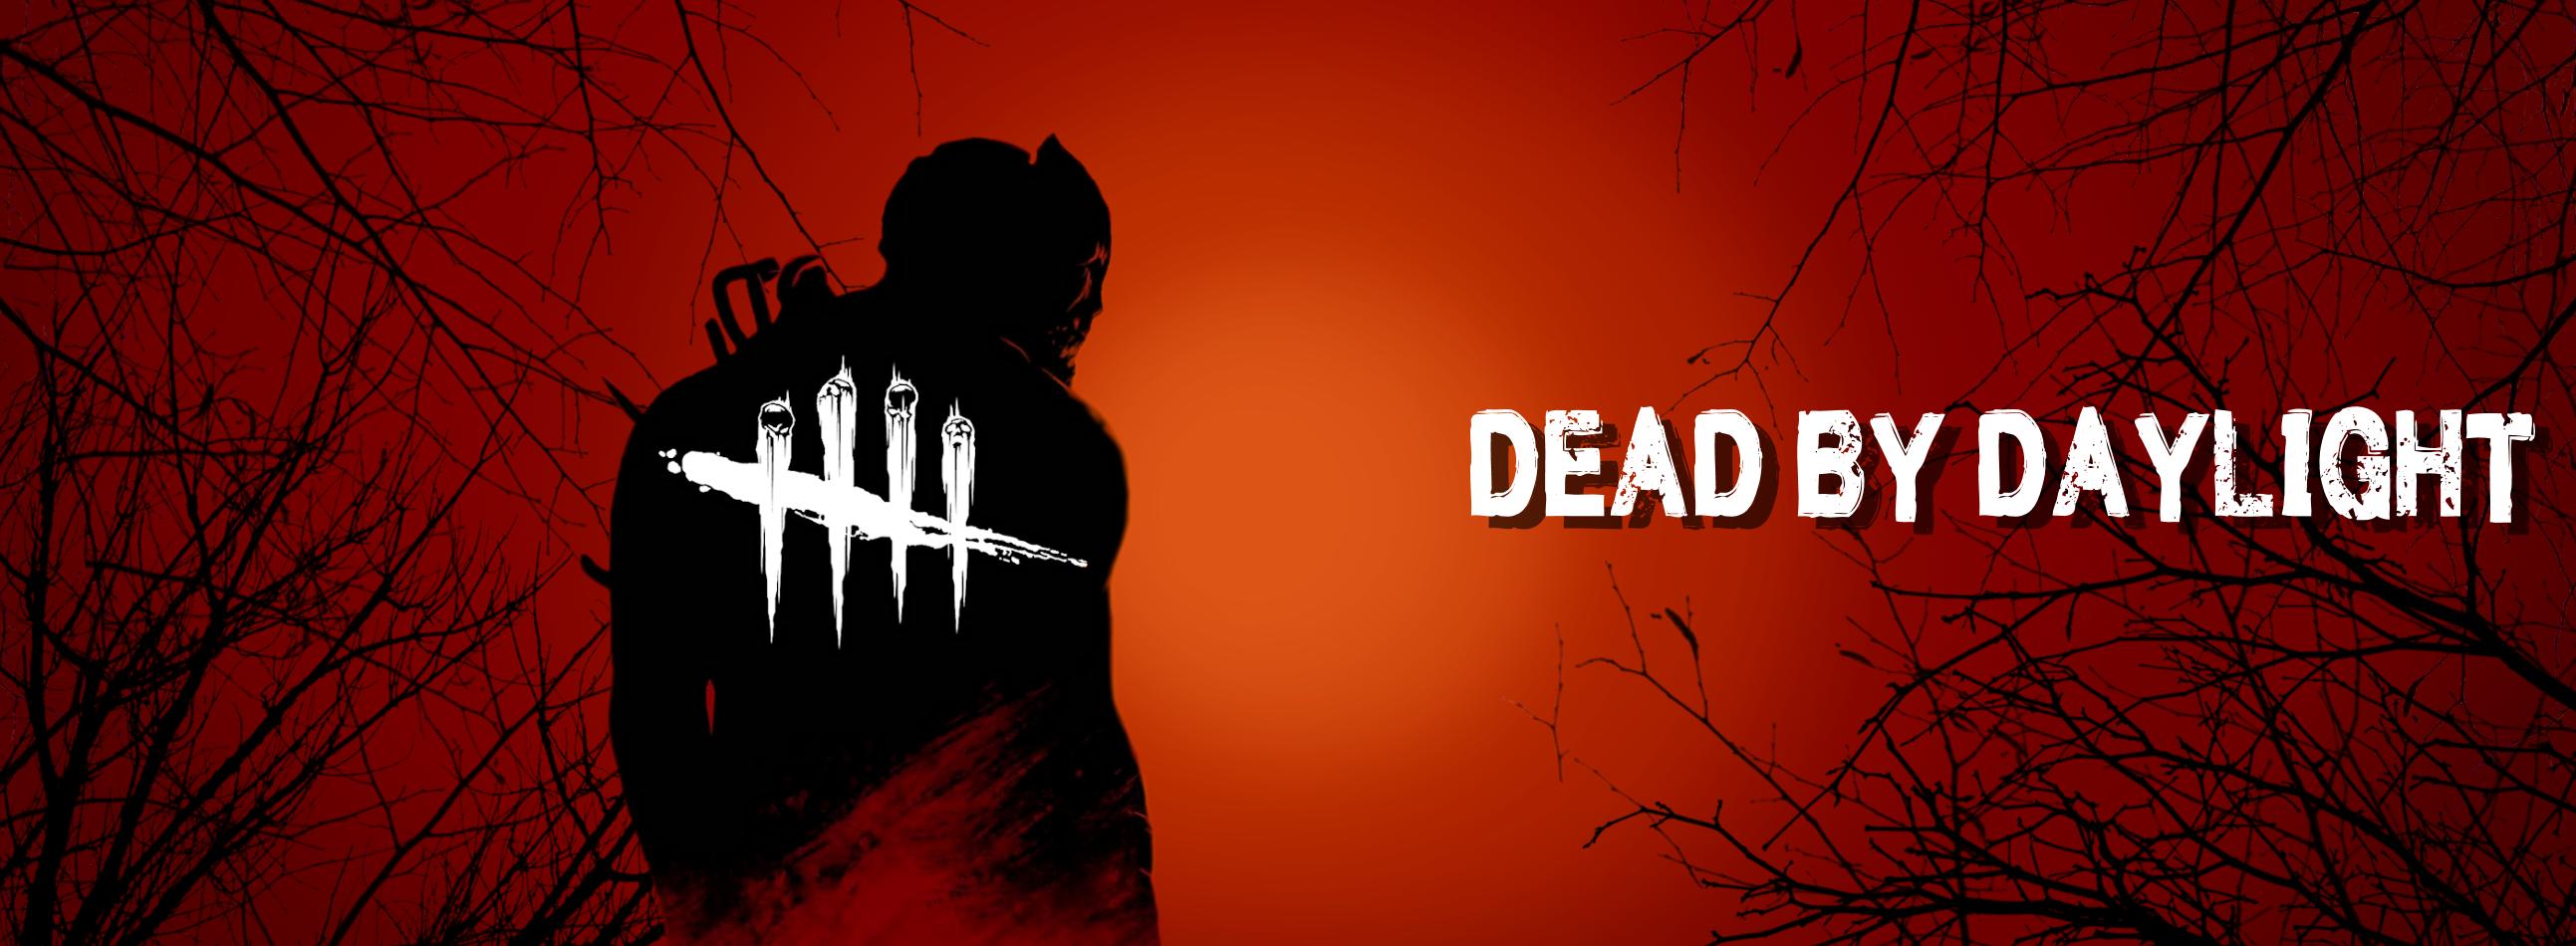 dead_by_daylight_red_dawn_wallpaper_by_t